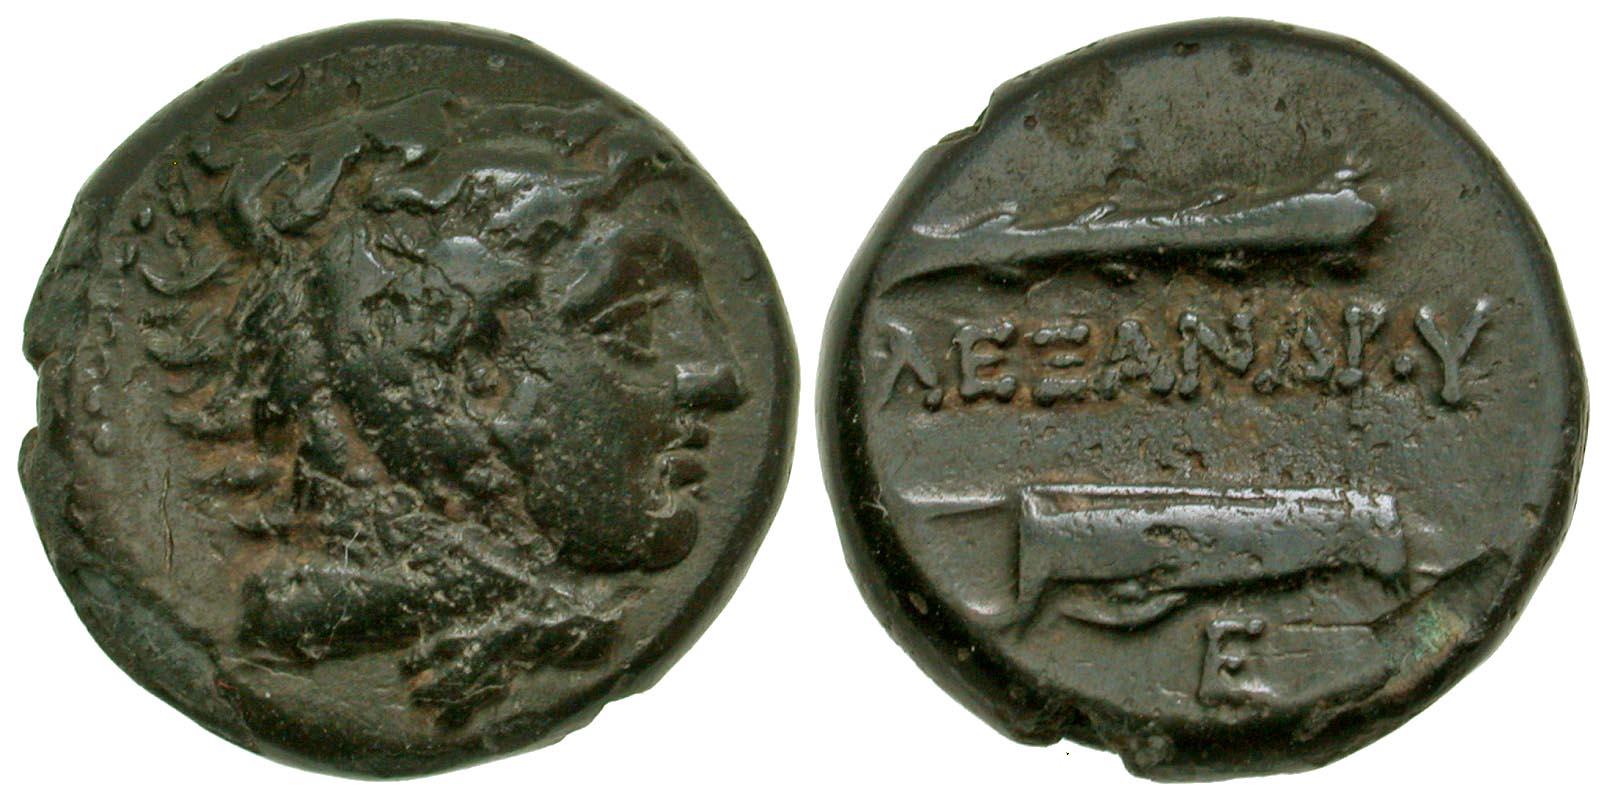 Macedonian Kingdom. Alexander III the Great. 336-323 B.C. AE 17. Macedonian mint, Struck 336-323 B.C.